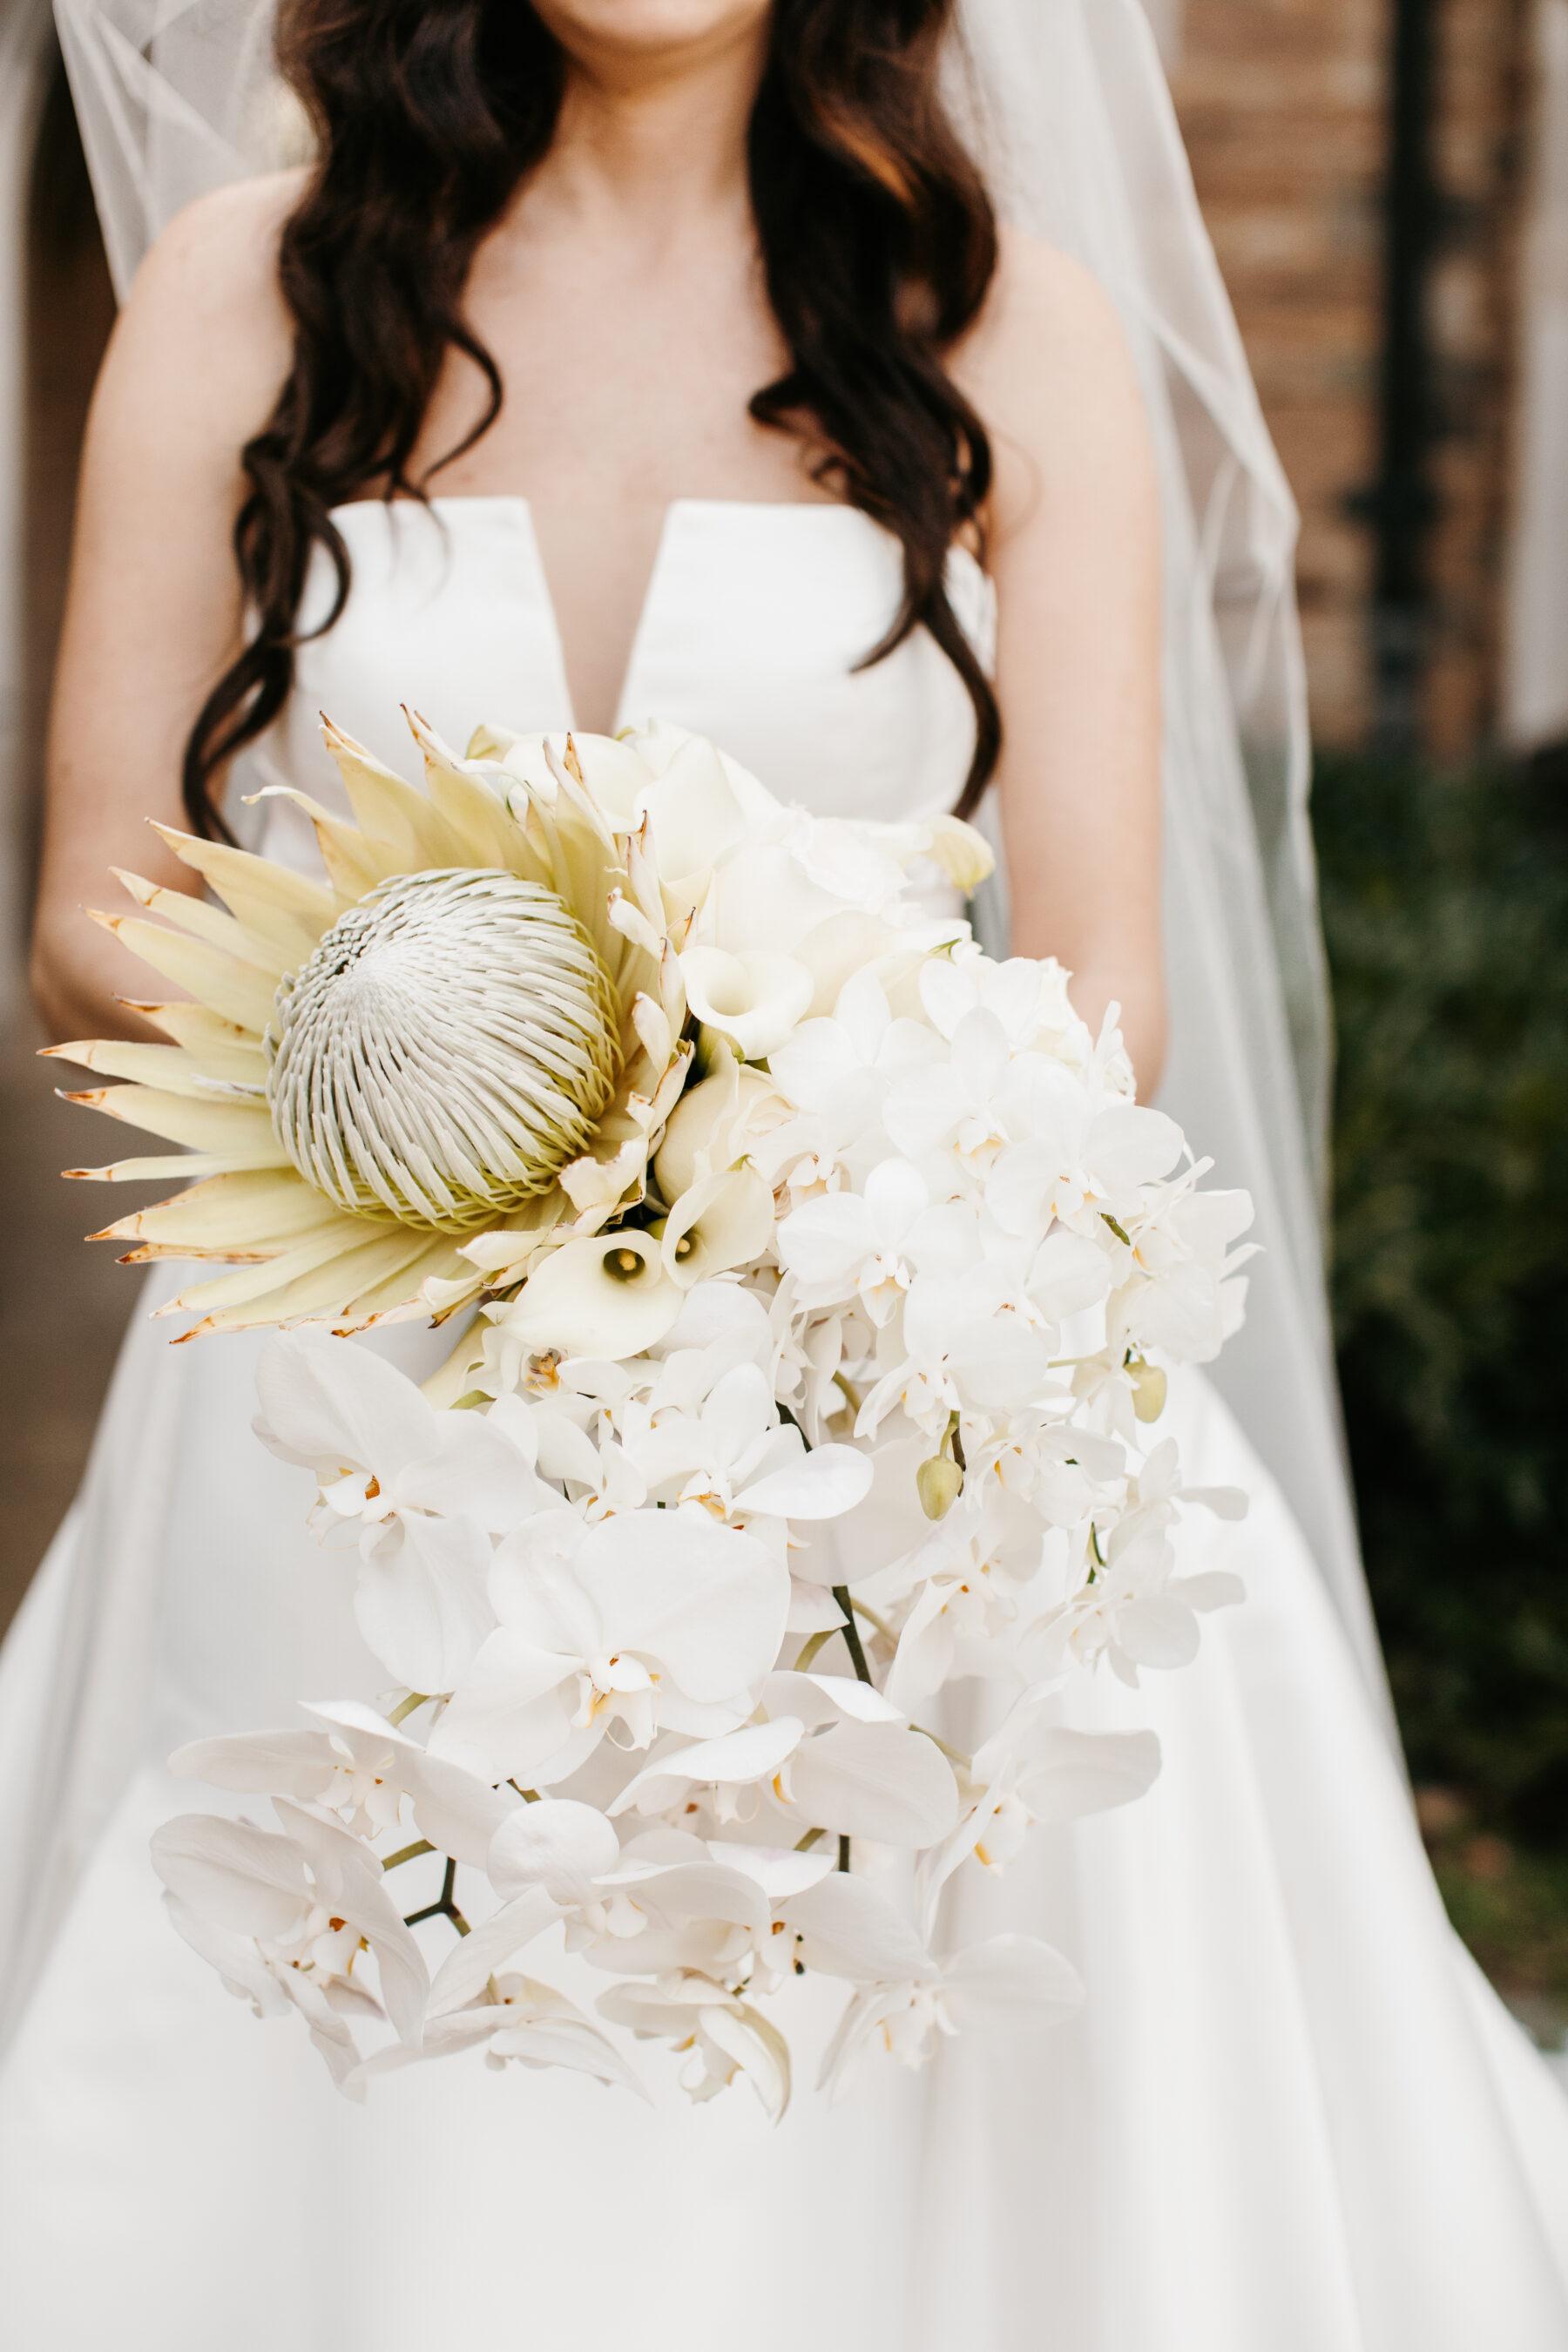 White protea wedding bouquet by LMA Designs | Nashville Bride Guide